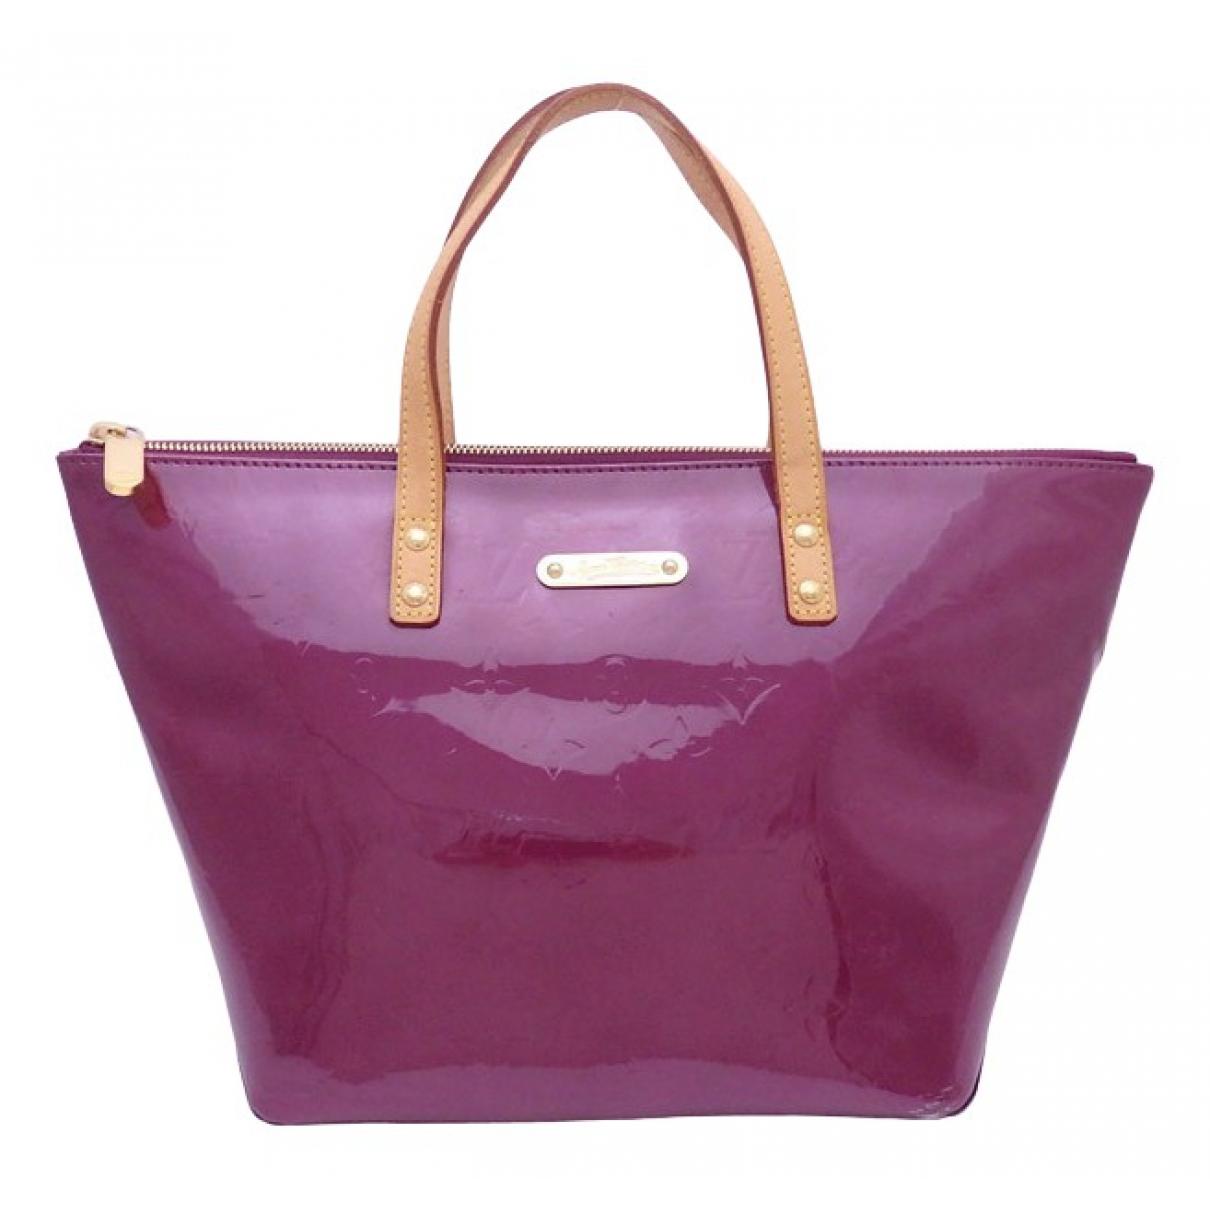 Louis Vuitton \N Purple Patent leather handbag for Women \N